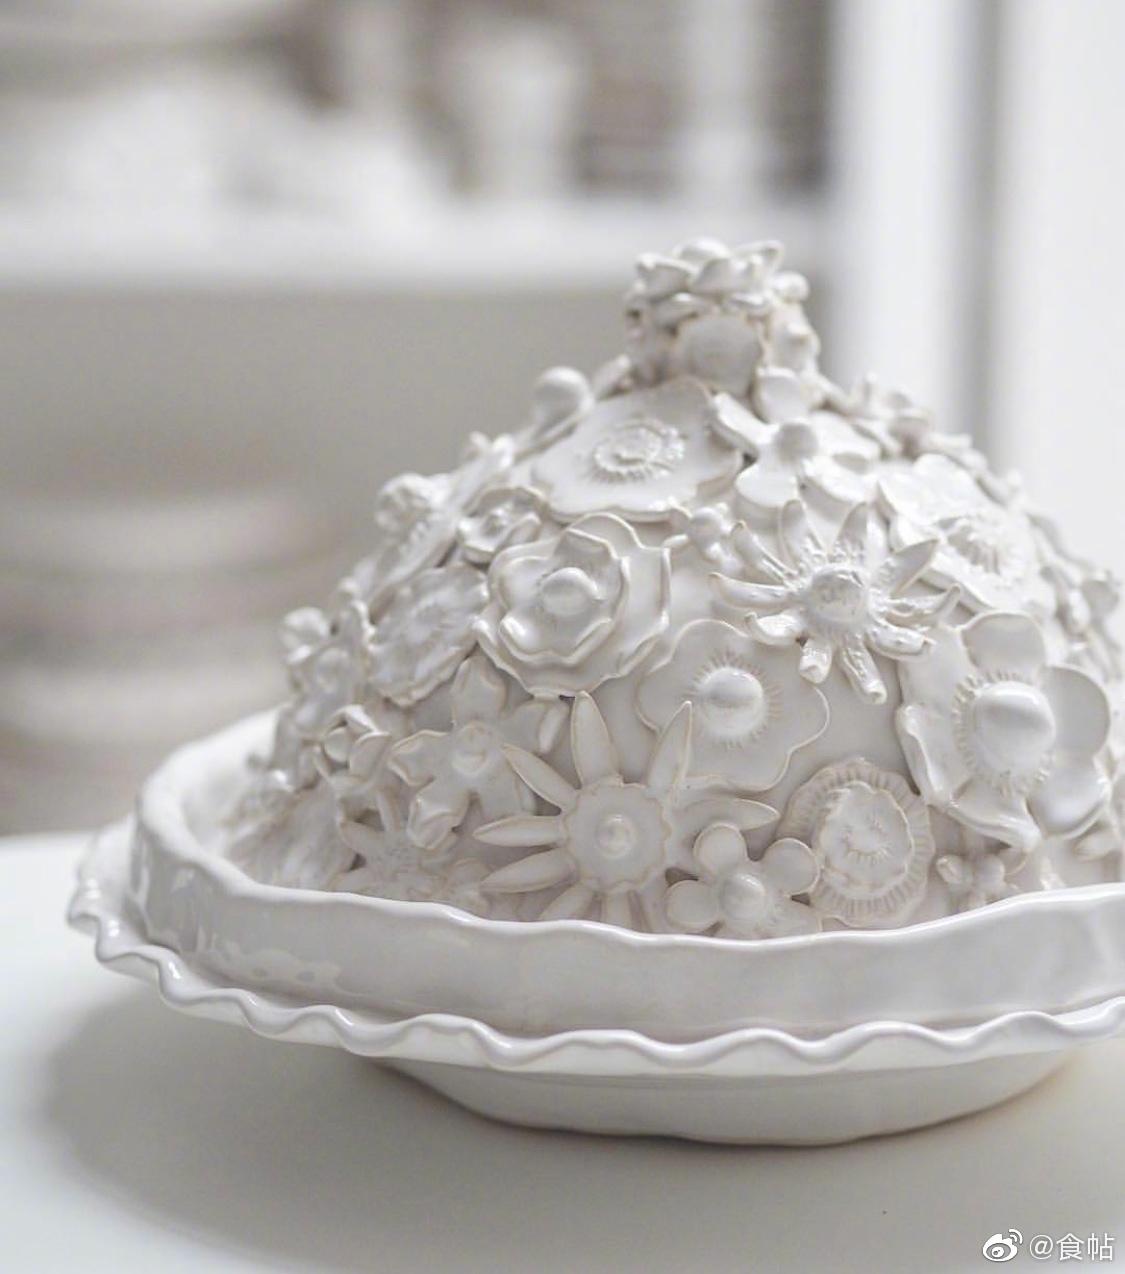 Marigold And Lettice是一家专注手工制作白色食器的品牌